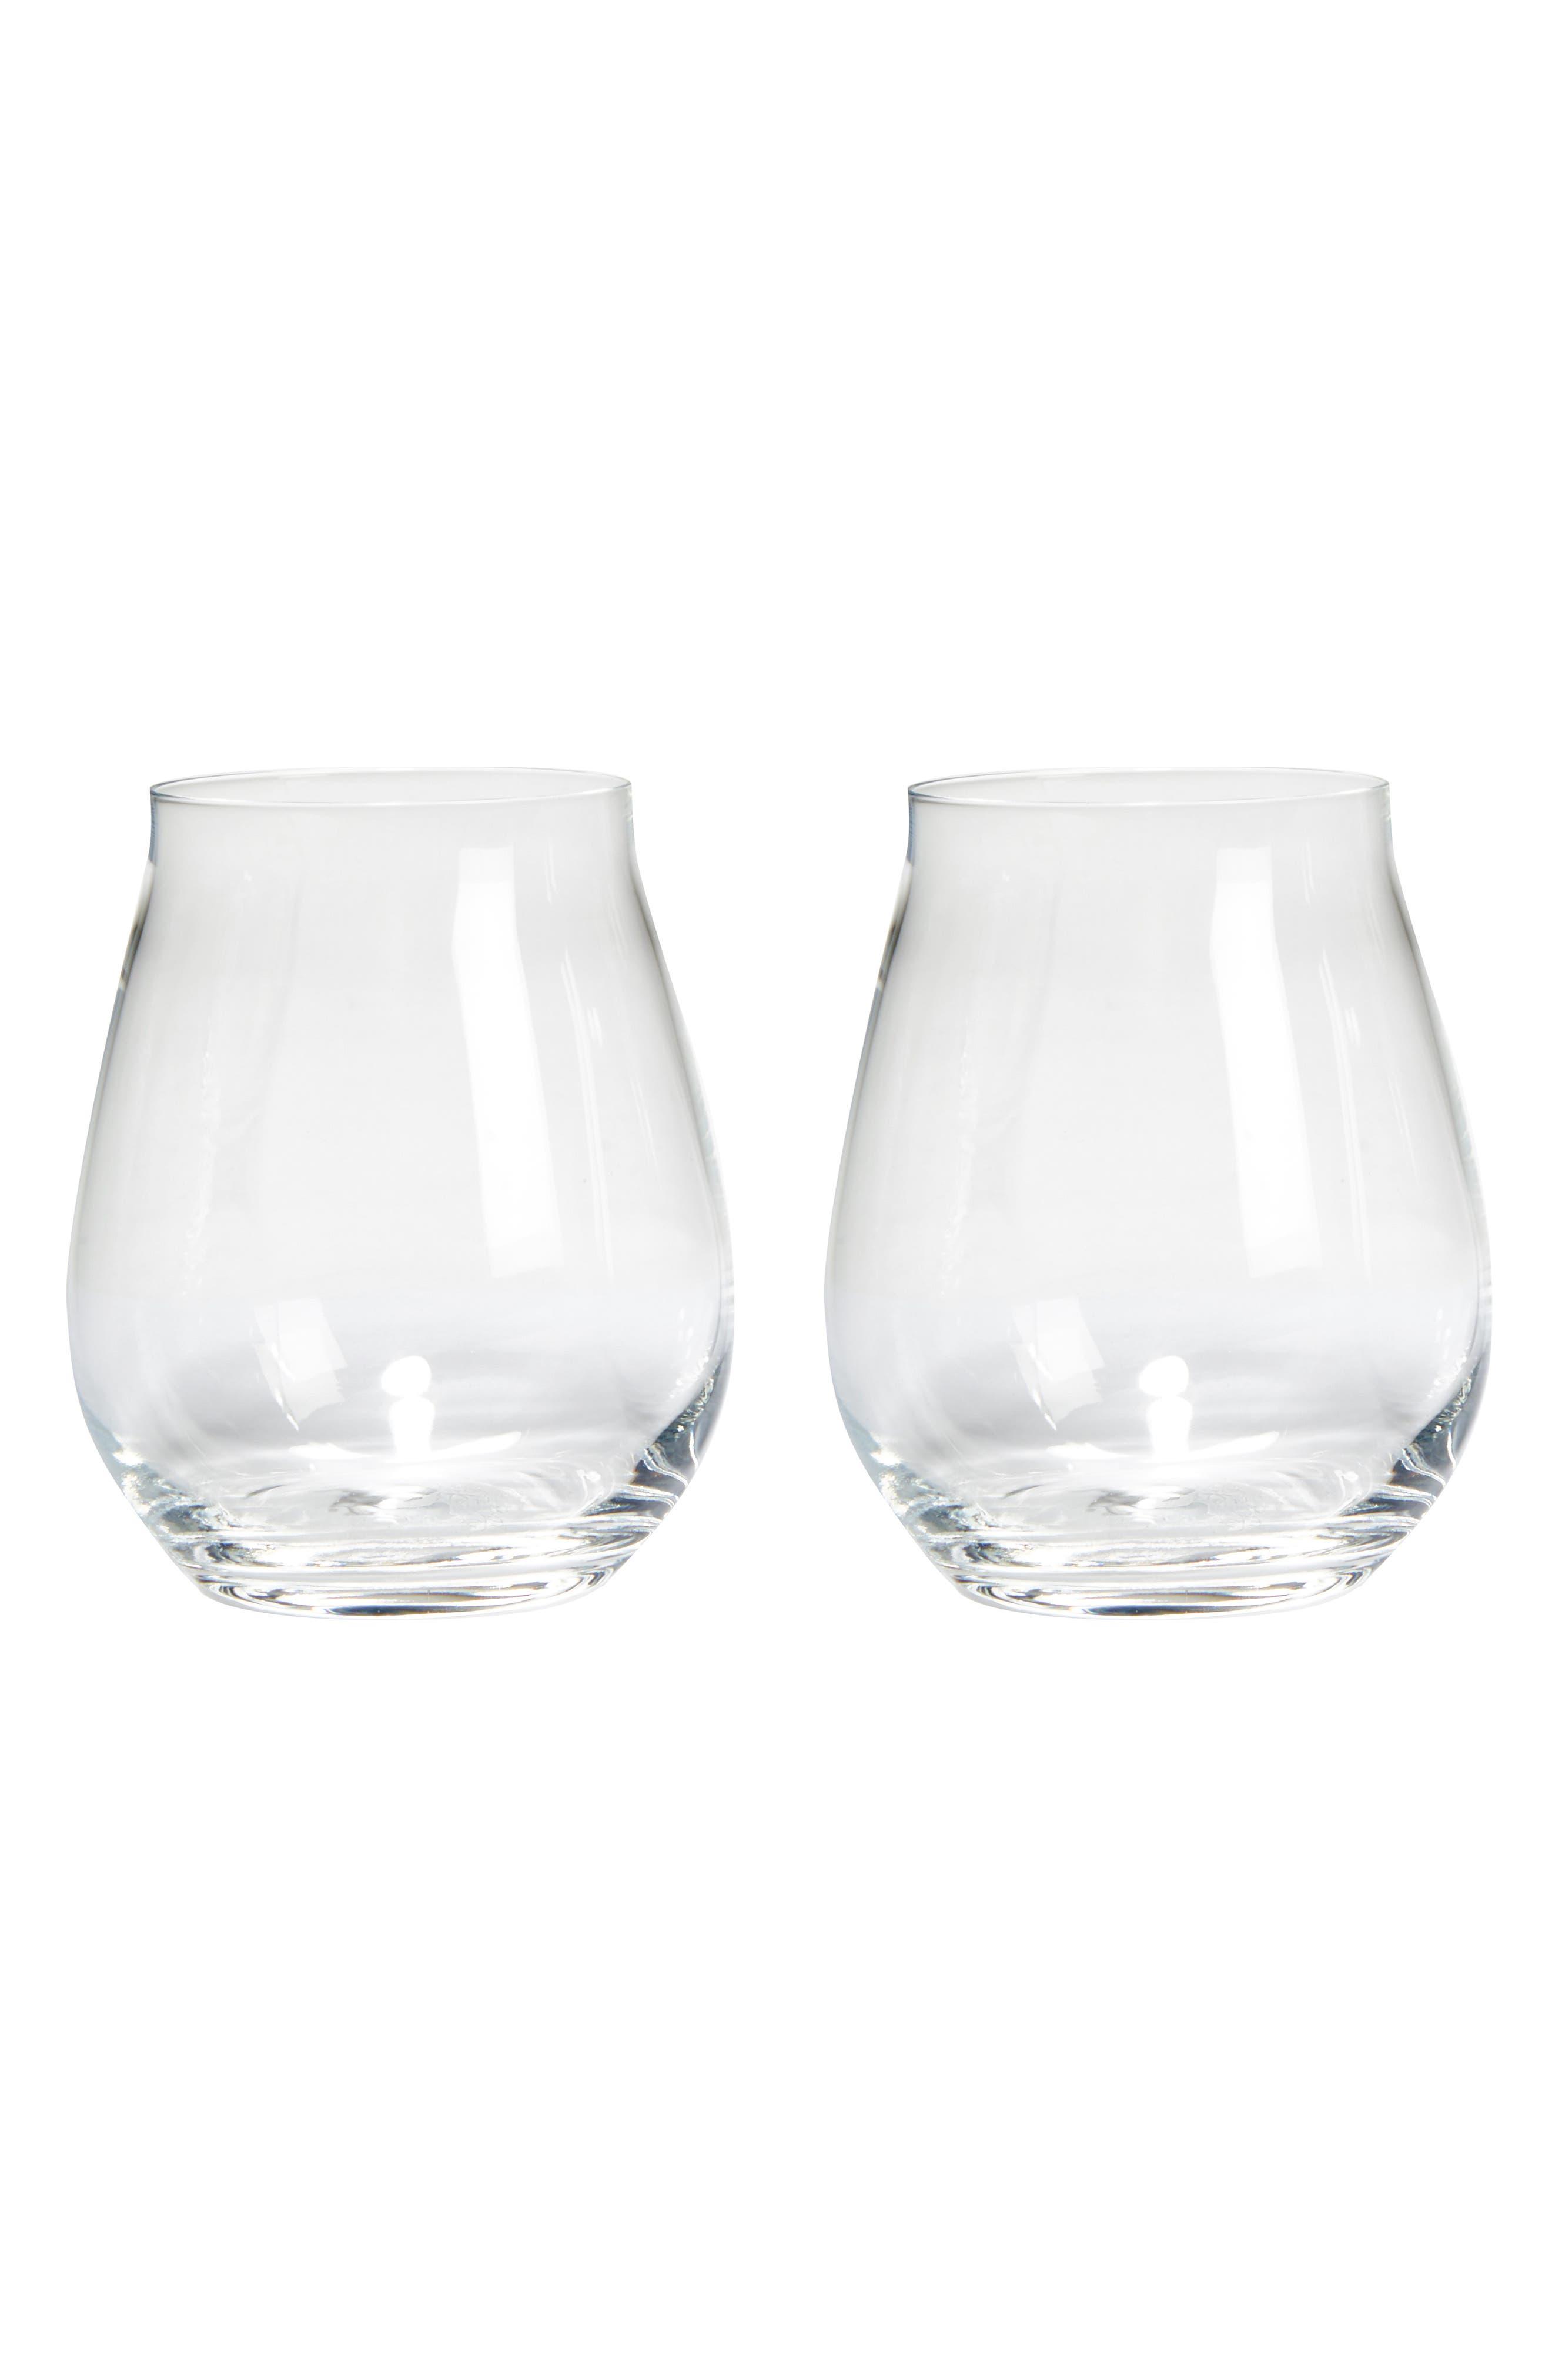 Luigi Bormiolo Vinea Trebbiano Set of 2 Stemless Wine Glasses,                         Main,                         color, CLEAR